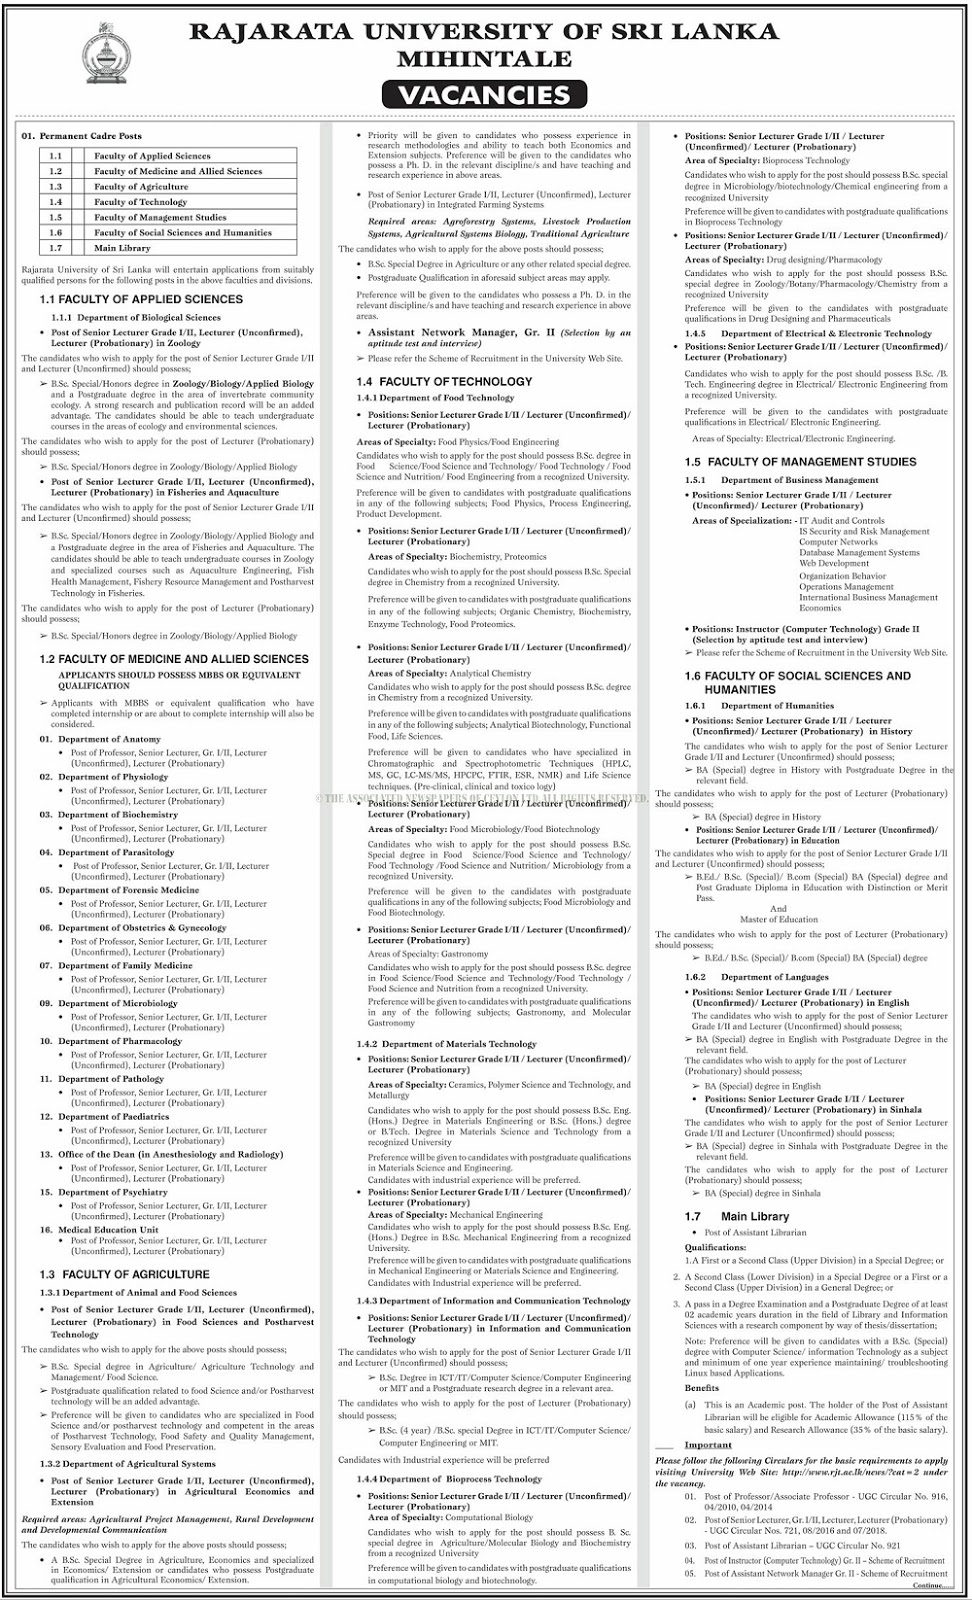 Vacancies at Rajarata University